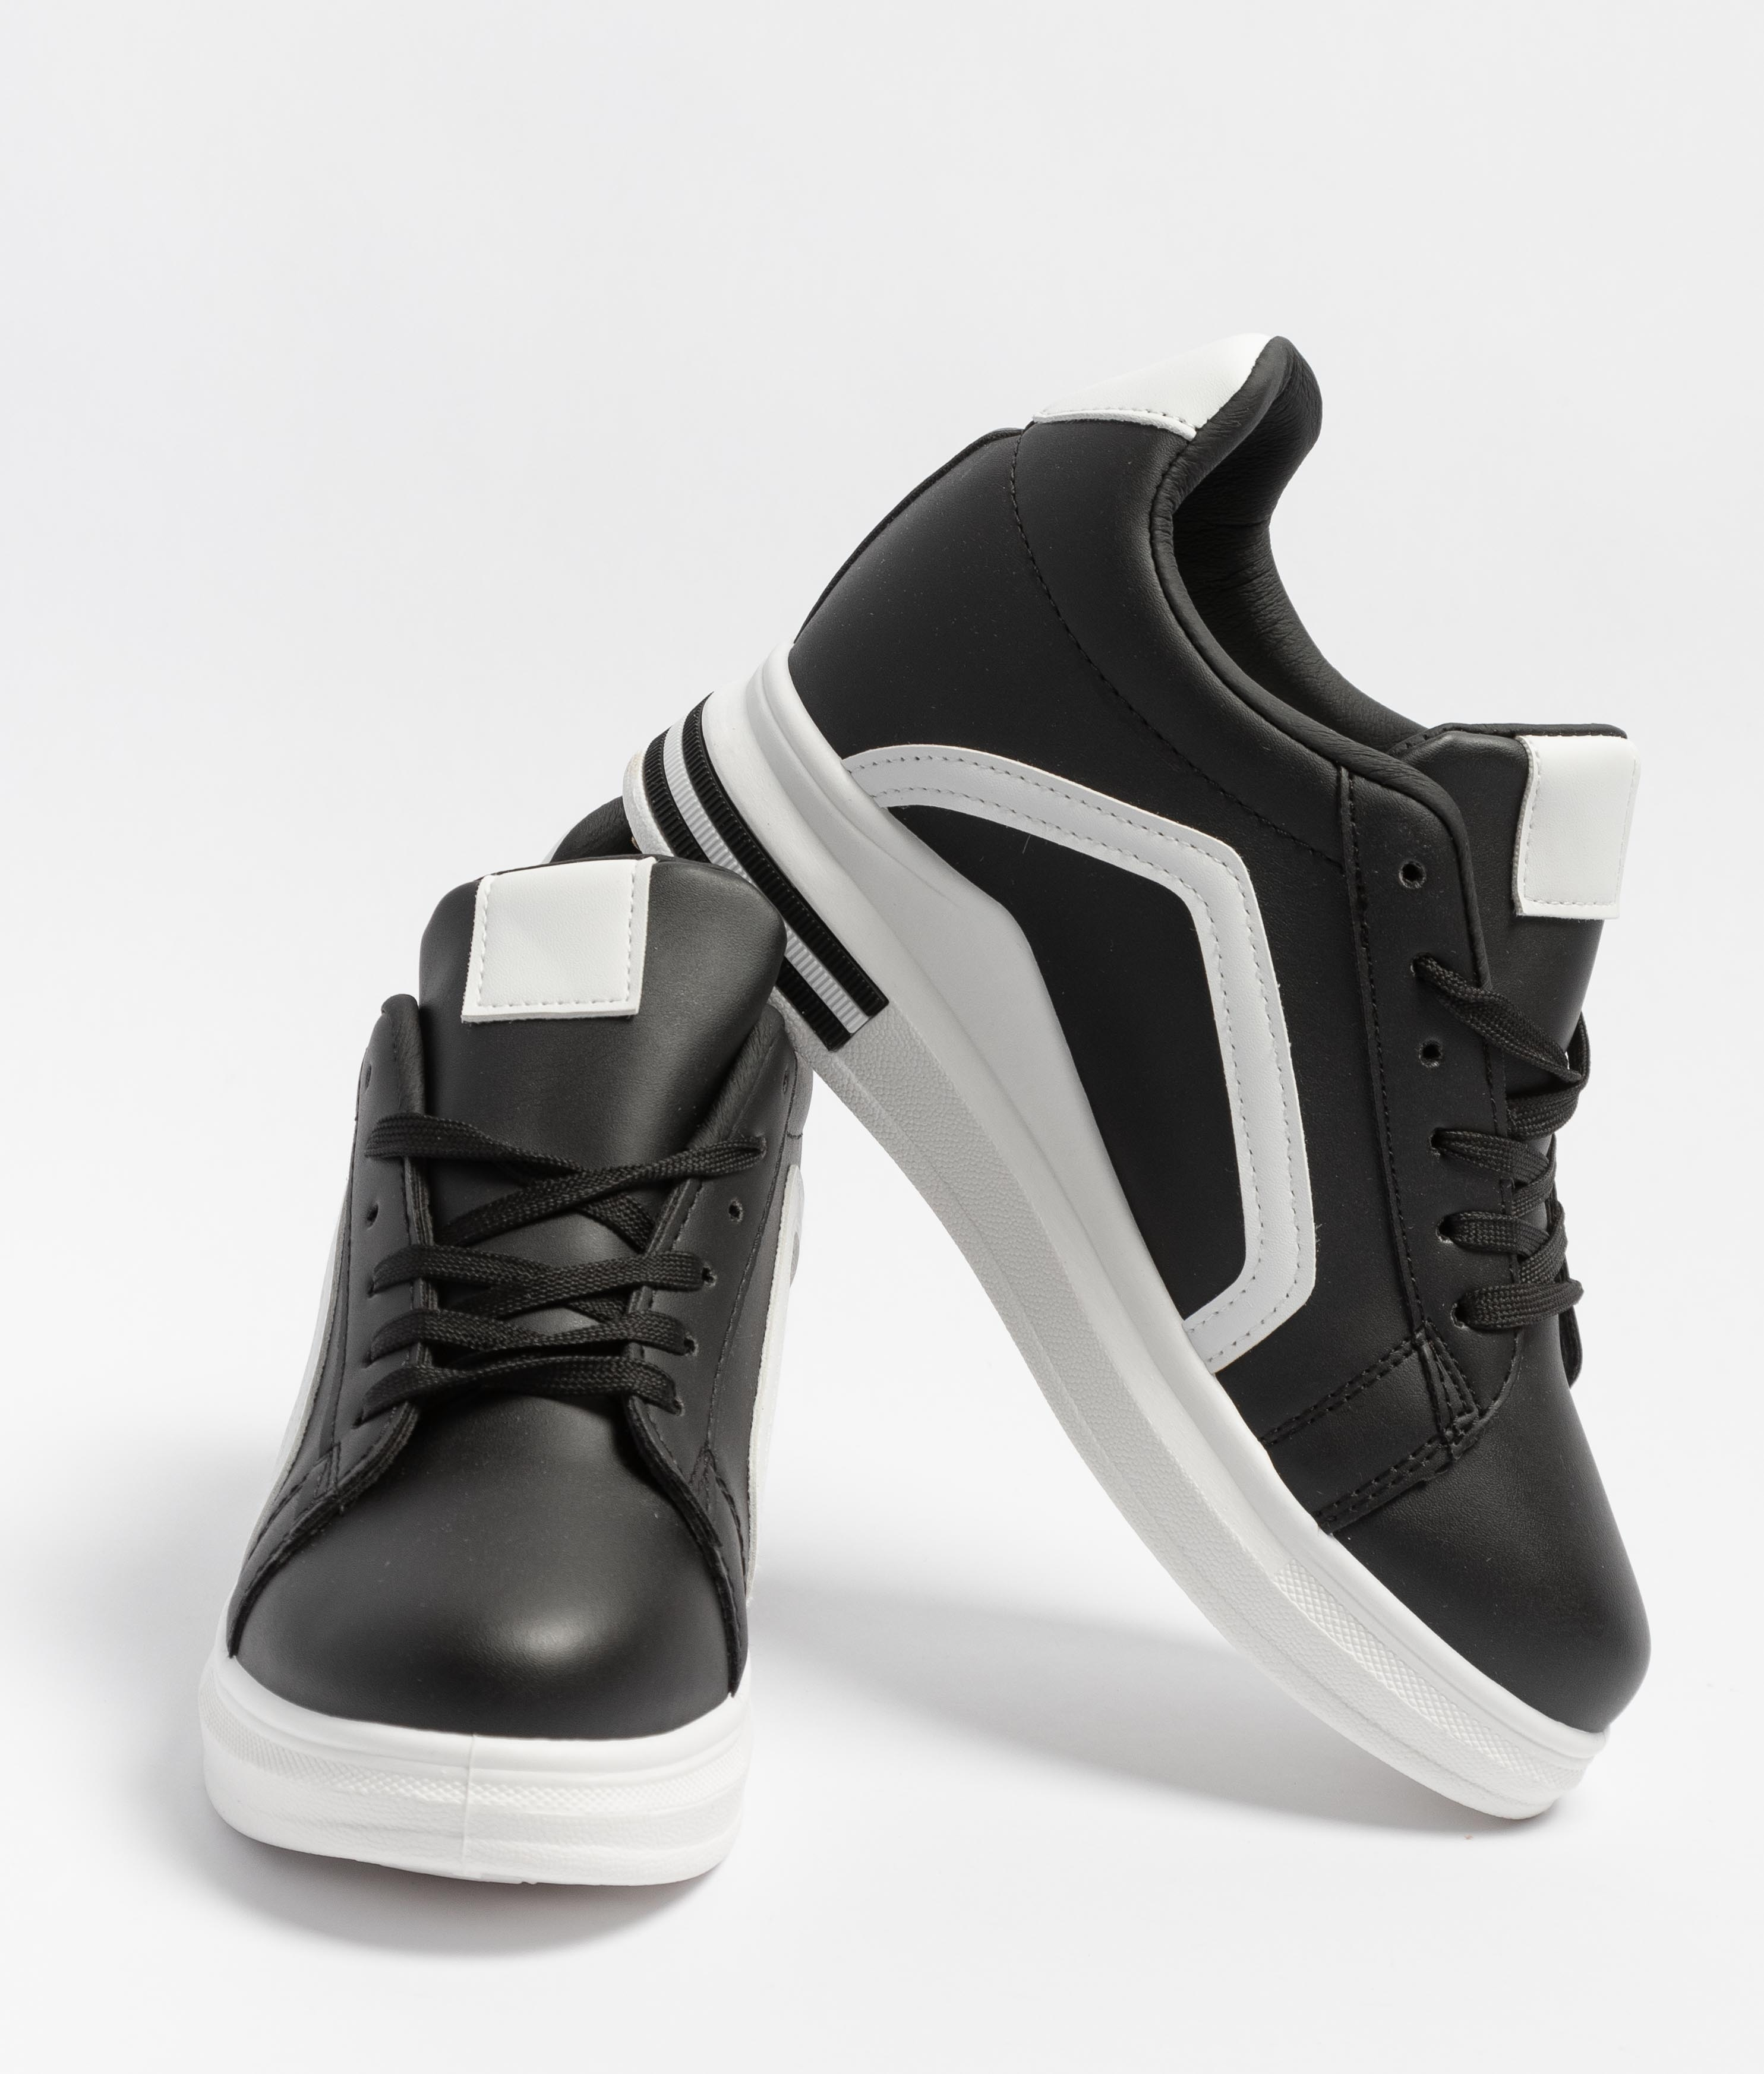 Sneakers Sauris - Preto